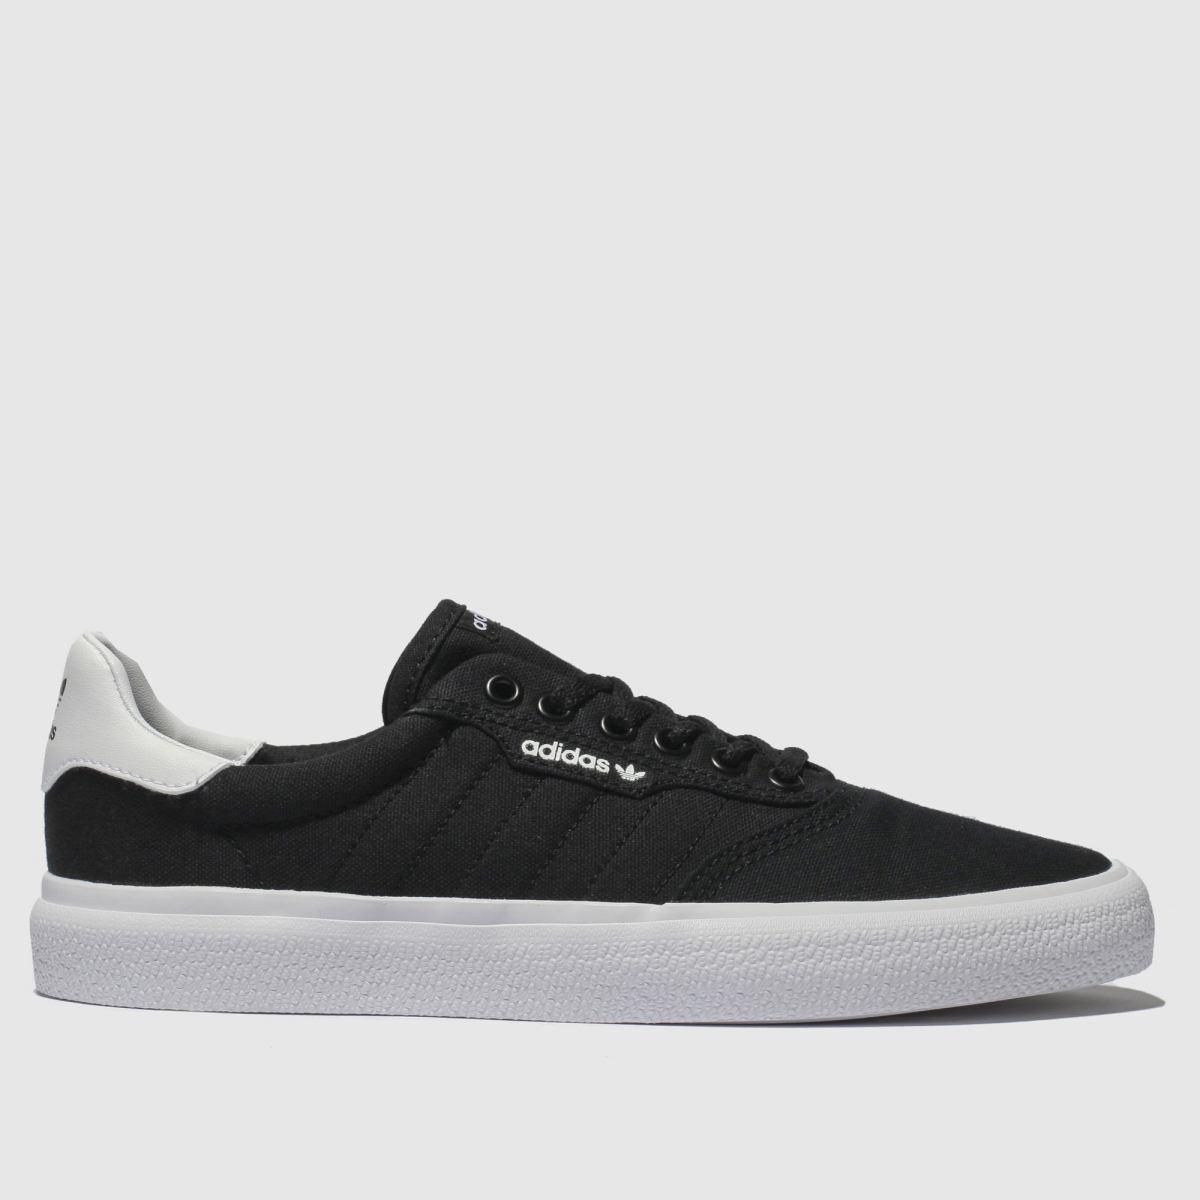 Adidas Skateboarding Black & Whitemc Trainers